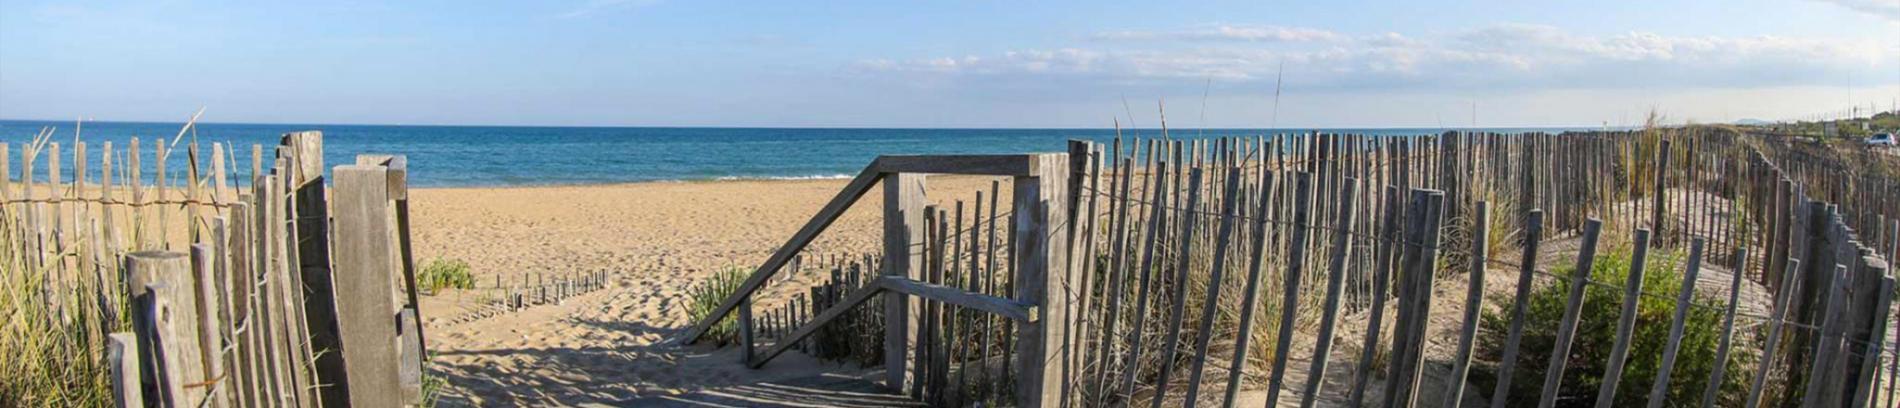 Slide Les plages